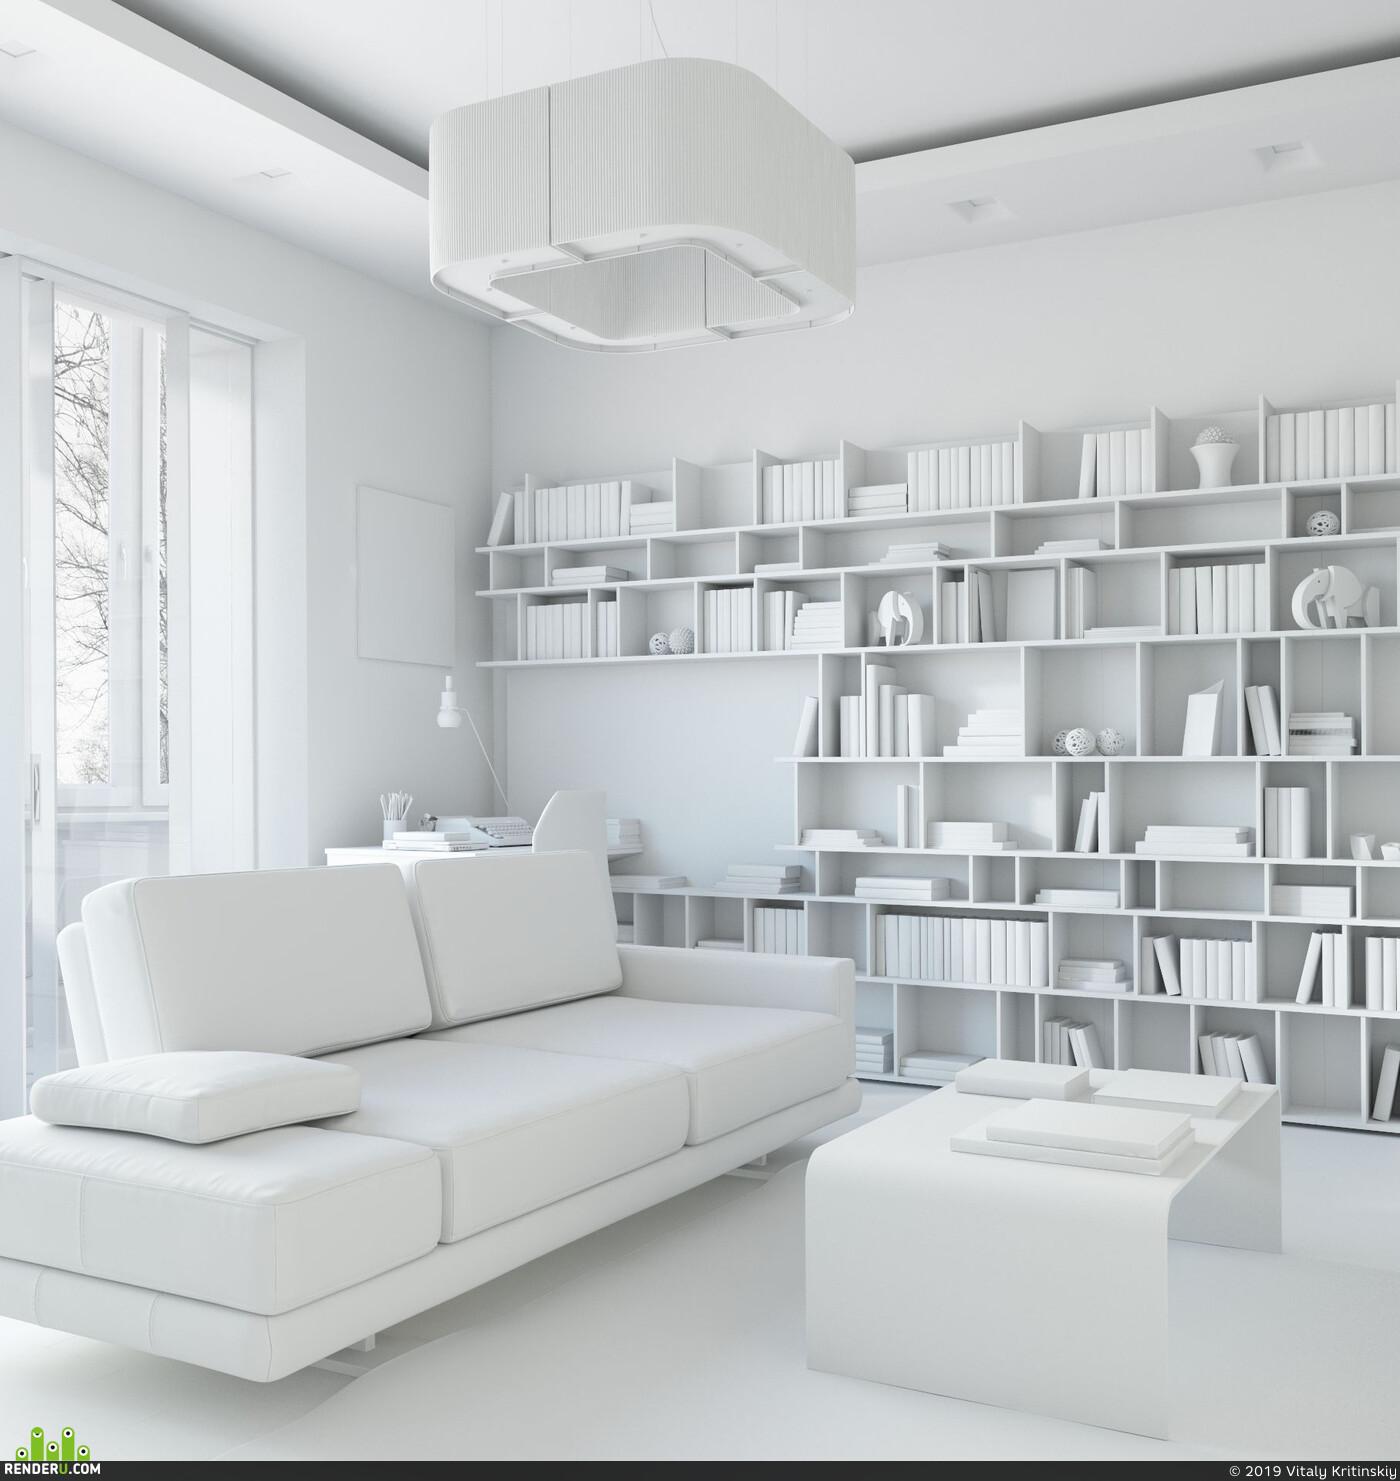 3ds Max, интерьер, архитектурная визуализация, архивиз